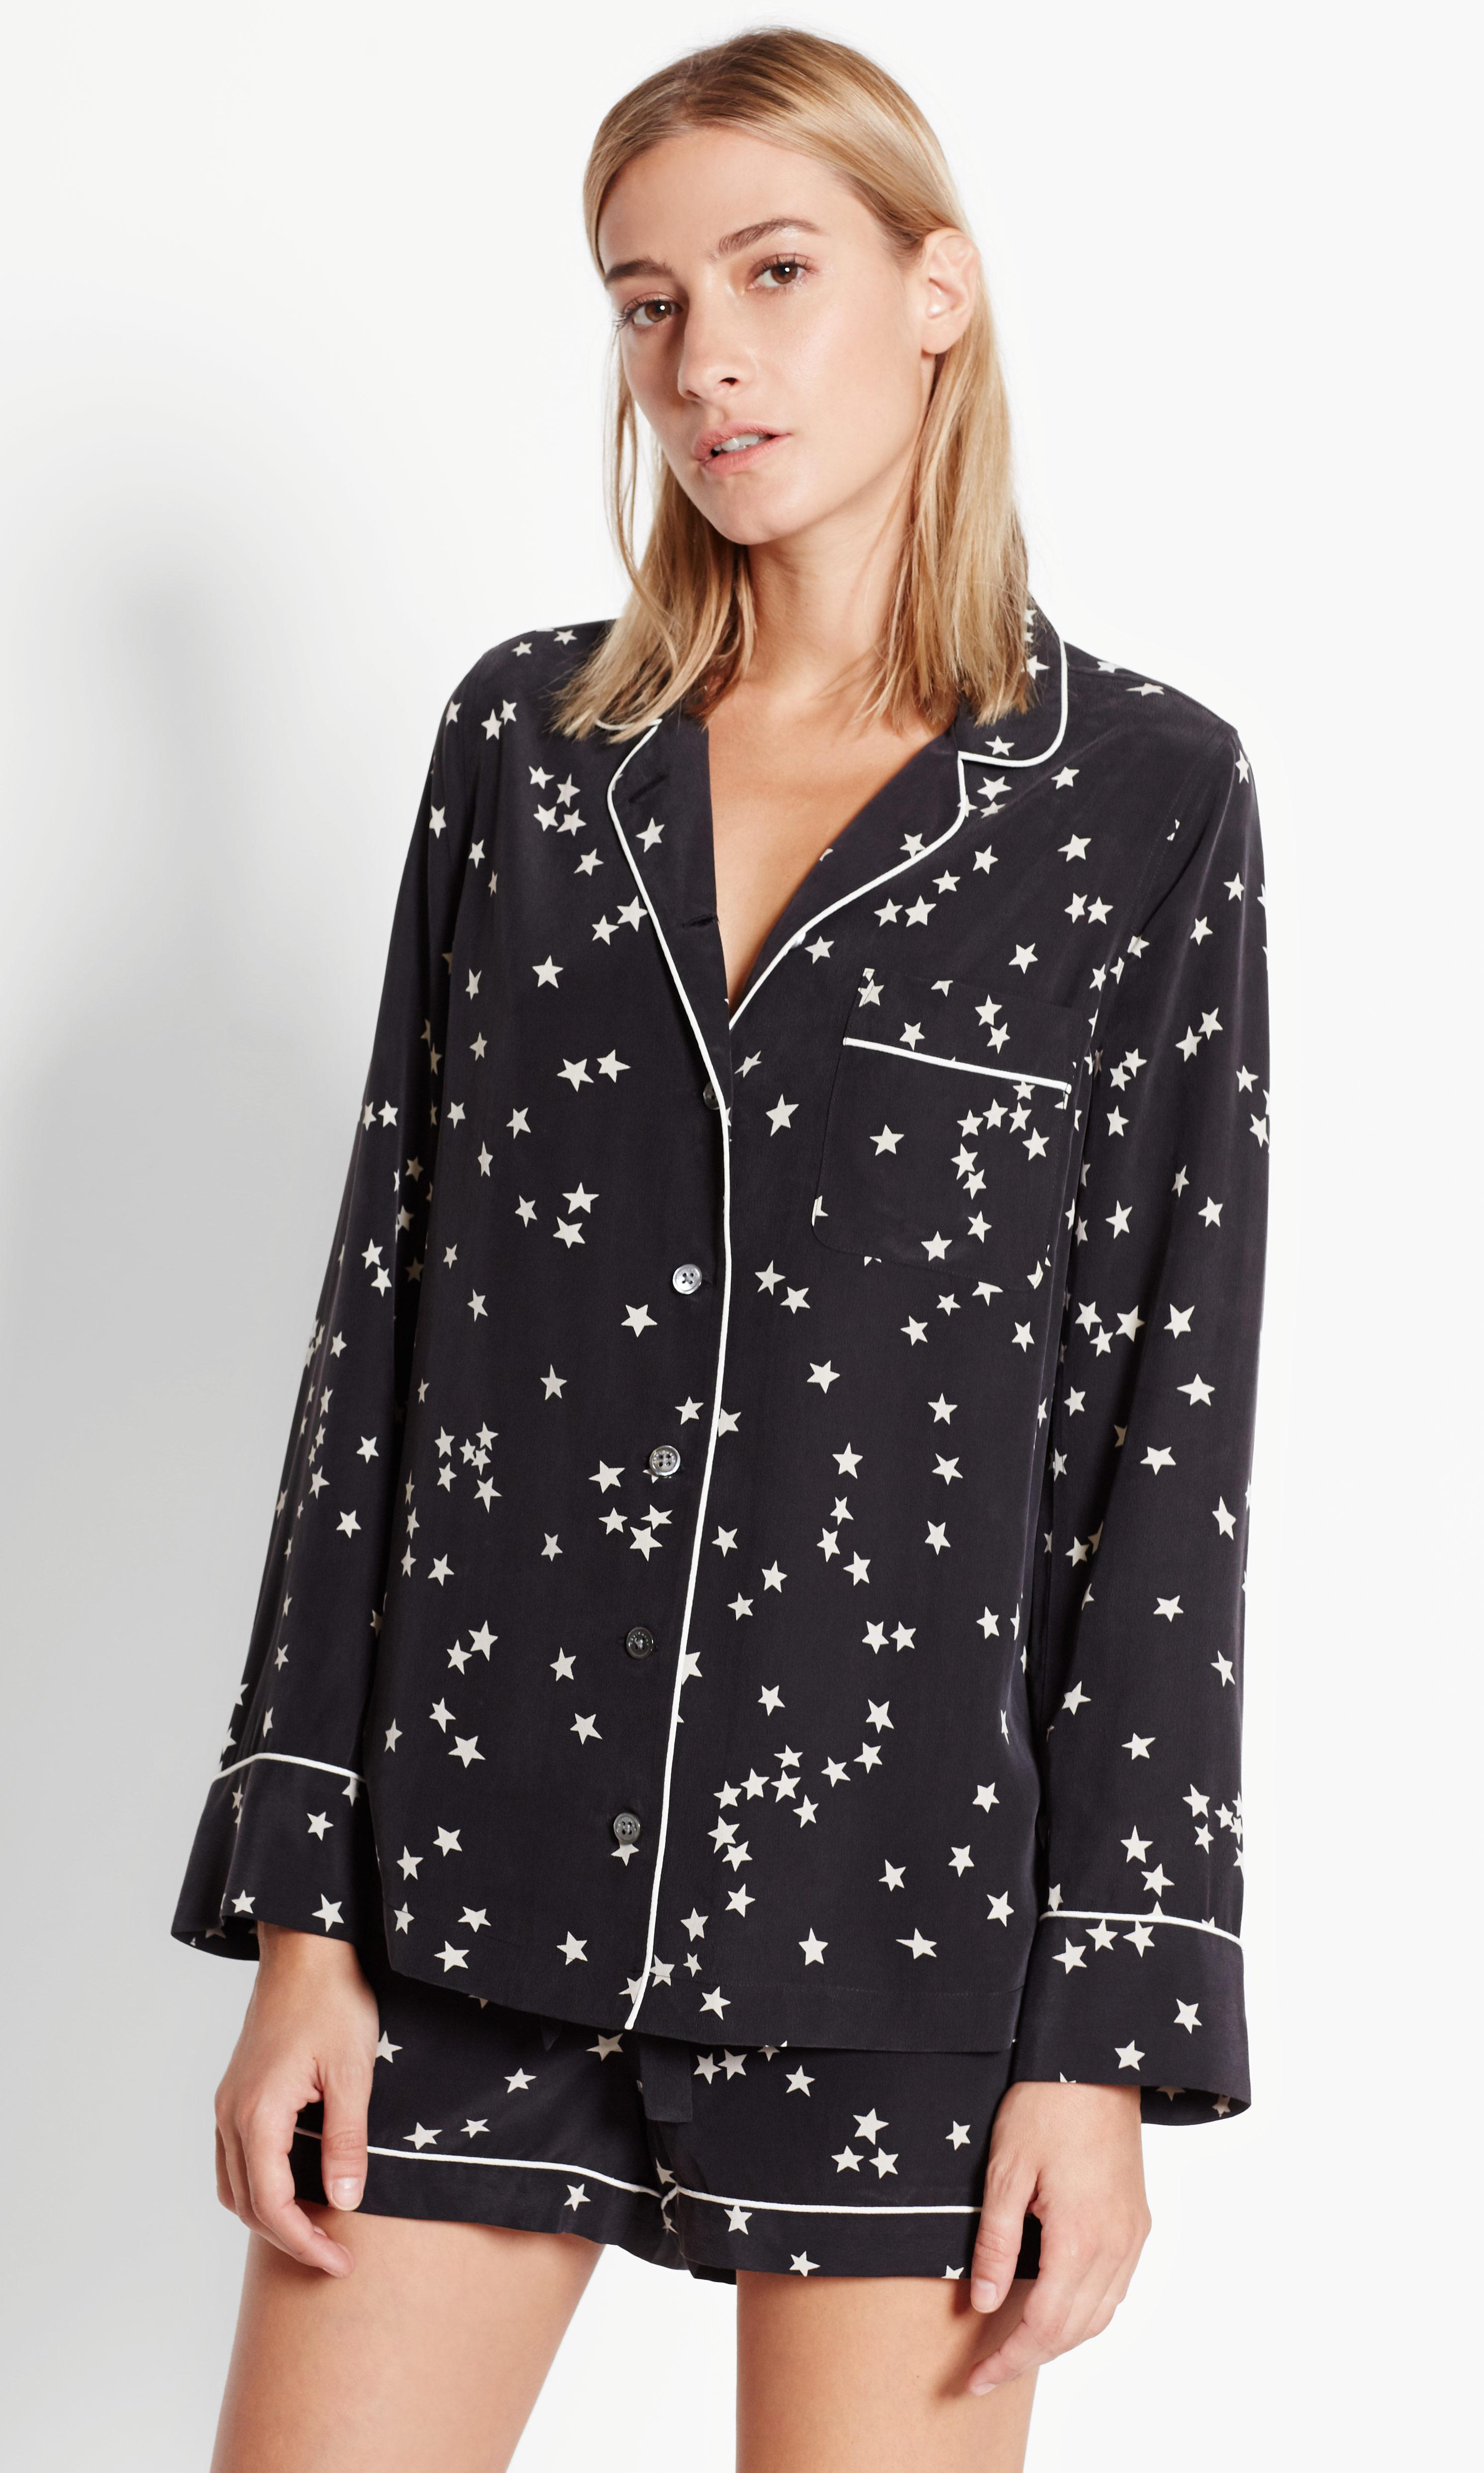 b6cd202161 Equipment Lillian Pajama Set in Black - Lyst